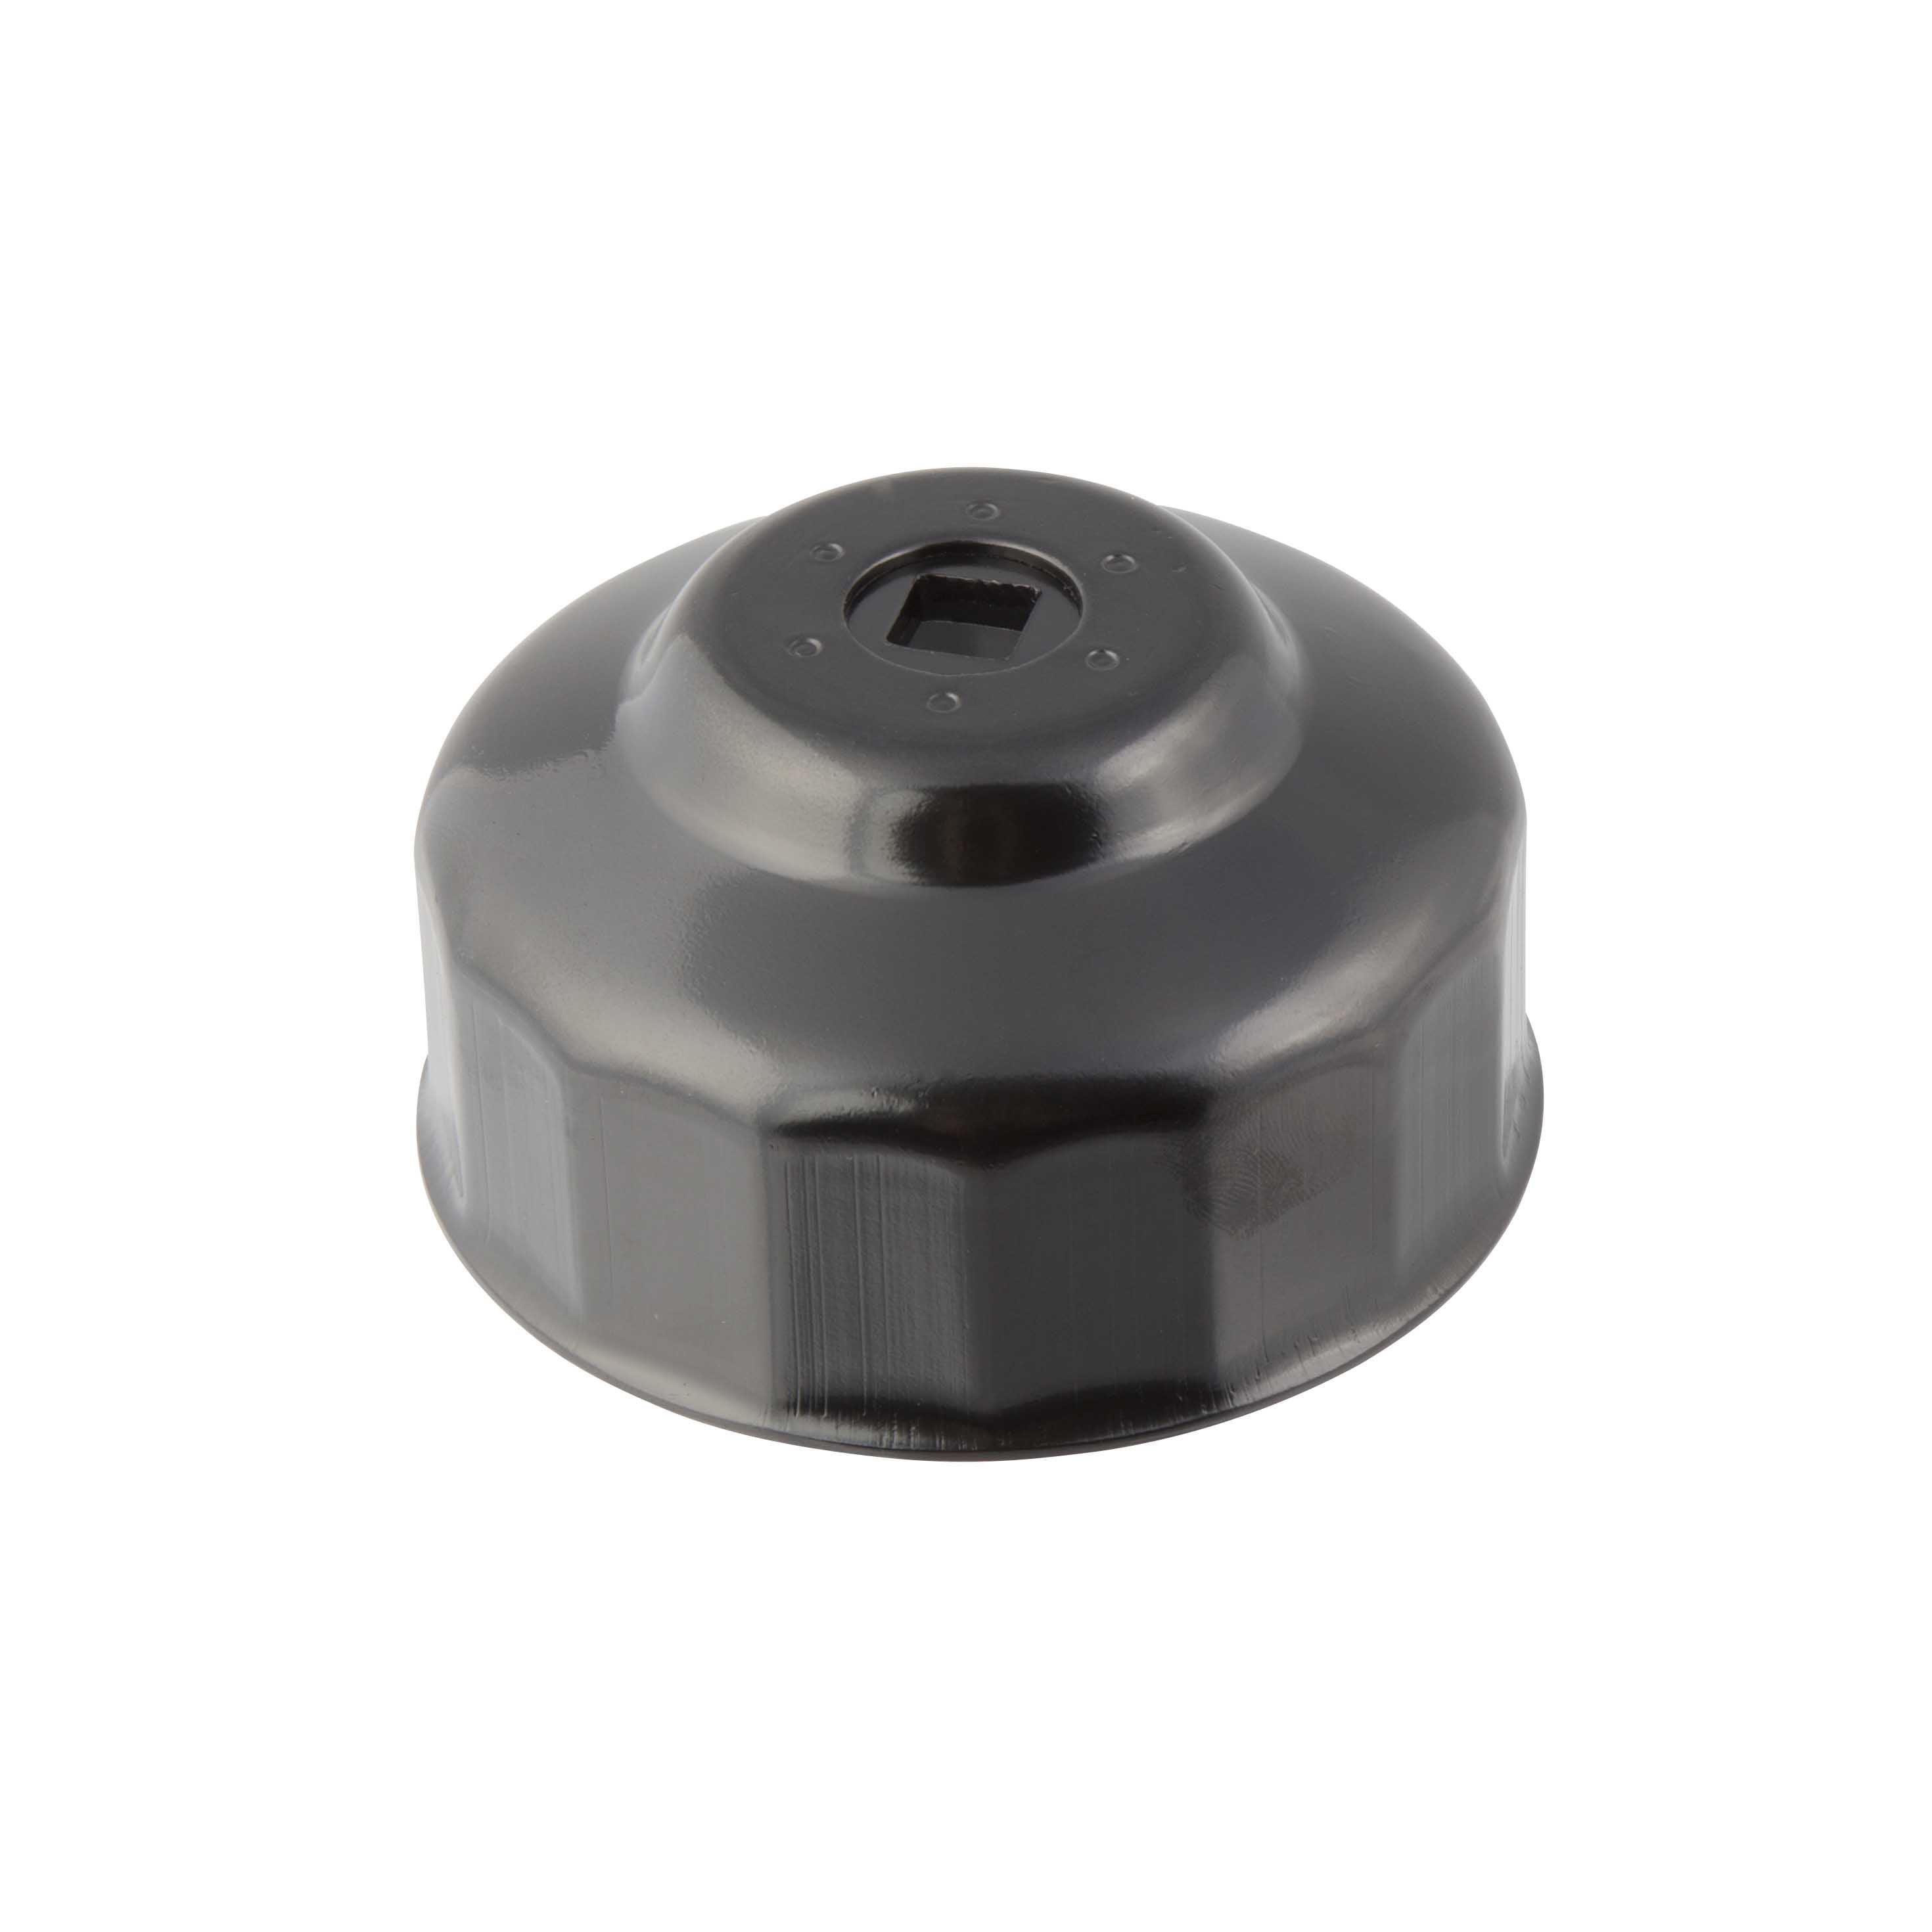 STEELMAN 06137 Oil Filter Cap Wrench 86mm x 16 Flute